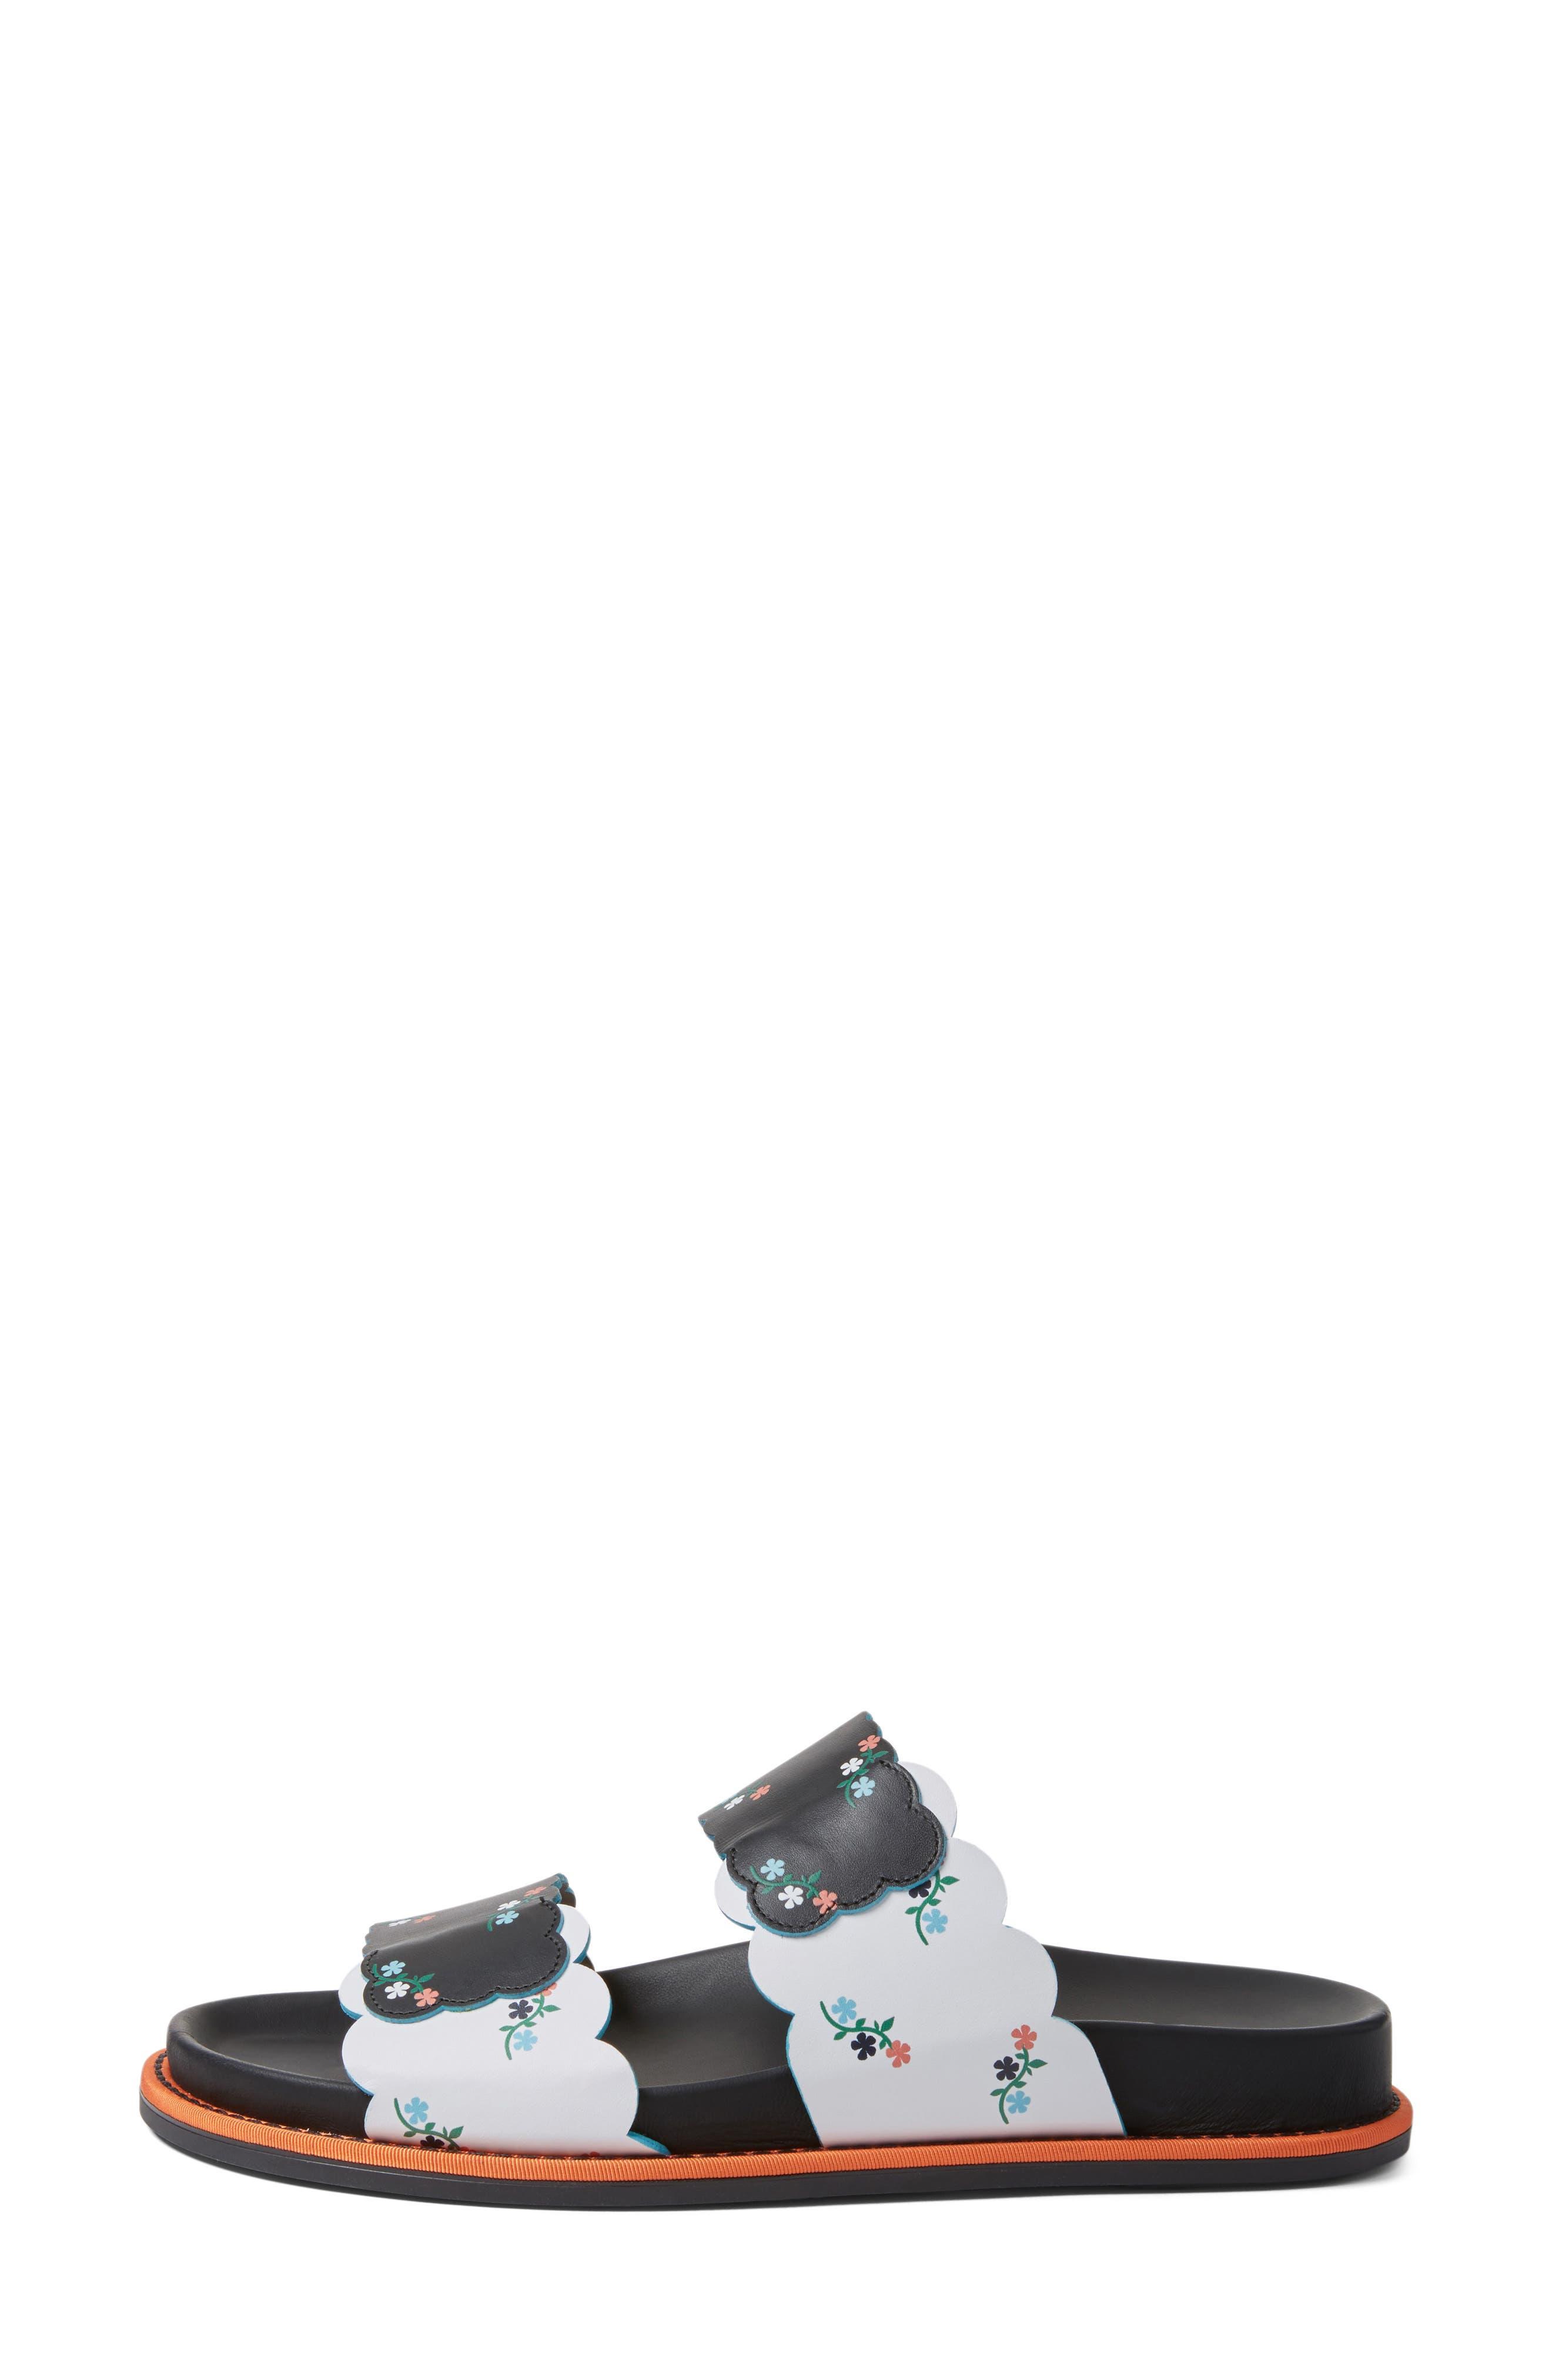 Scallop Slide Sandal,                             Alternate thumbnail 3, color,                             Black Floral